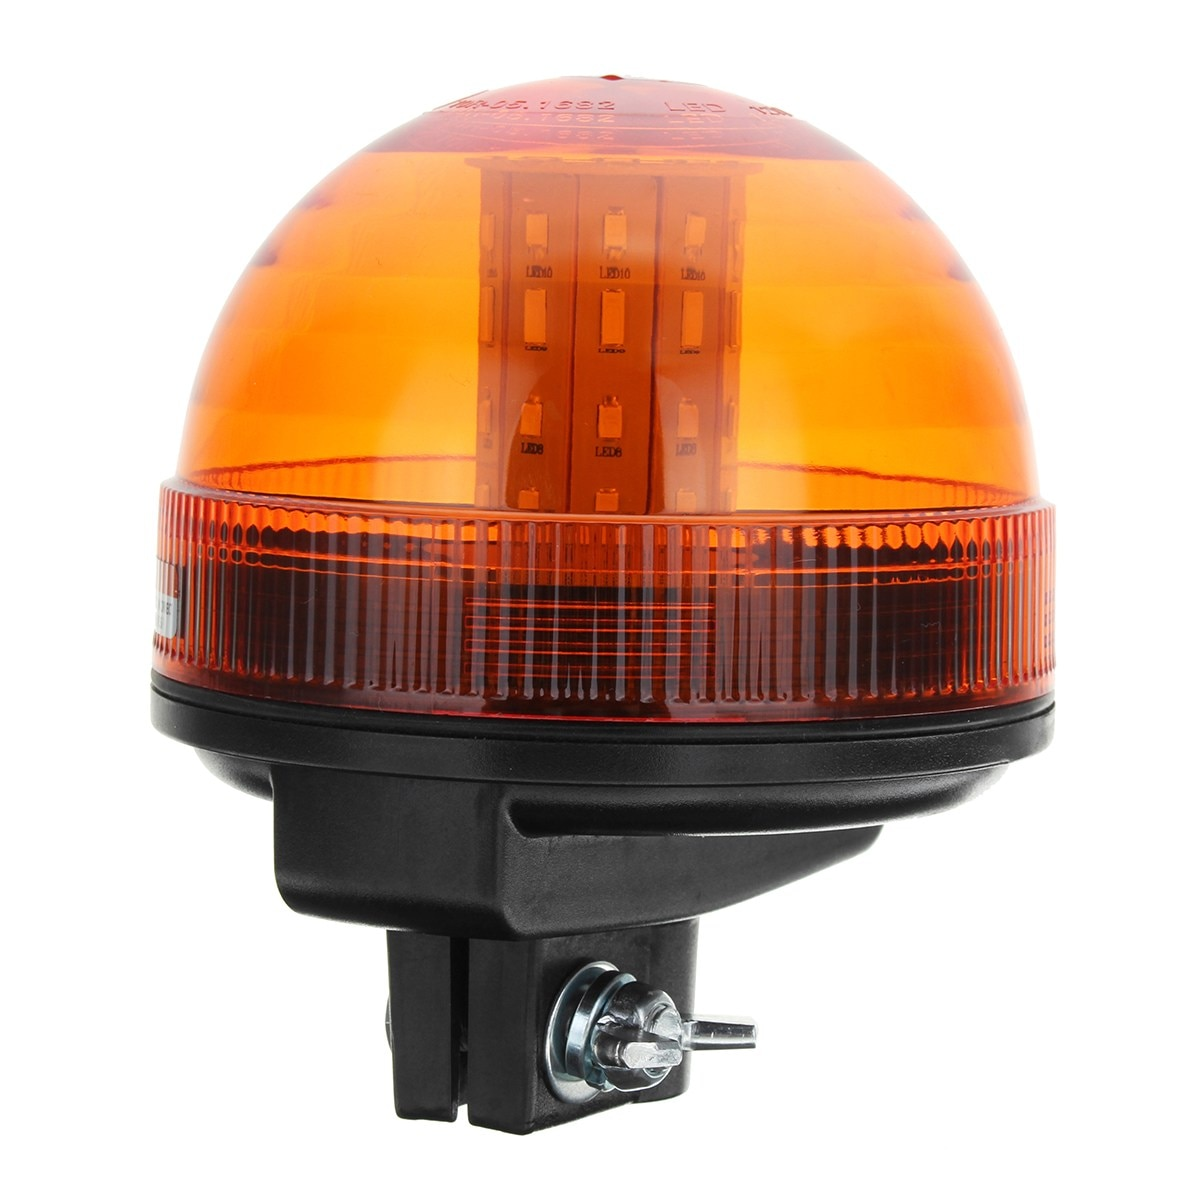 40 LED Rotating Flashing Amber Beacon Flexible Tractor Warning Light Roadway Safety